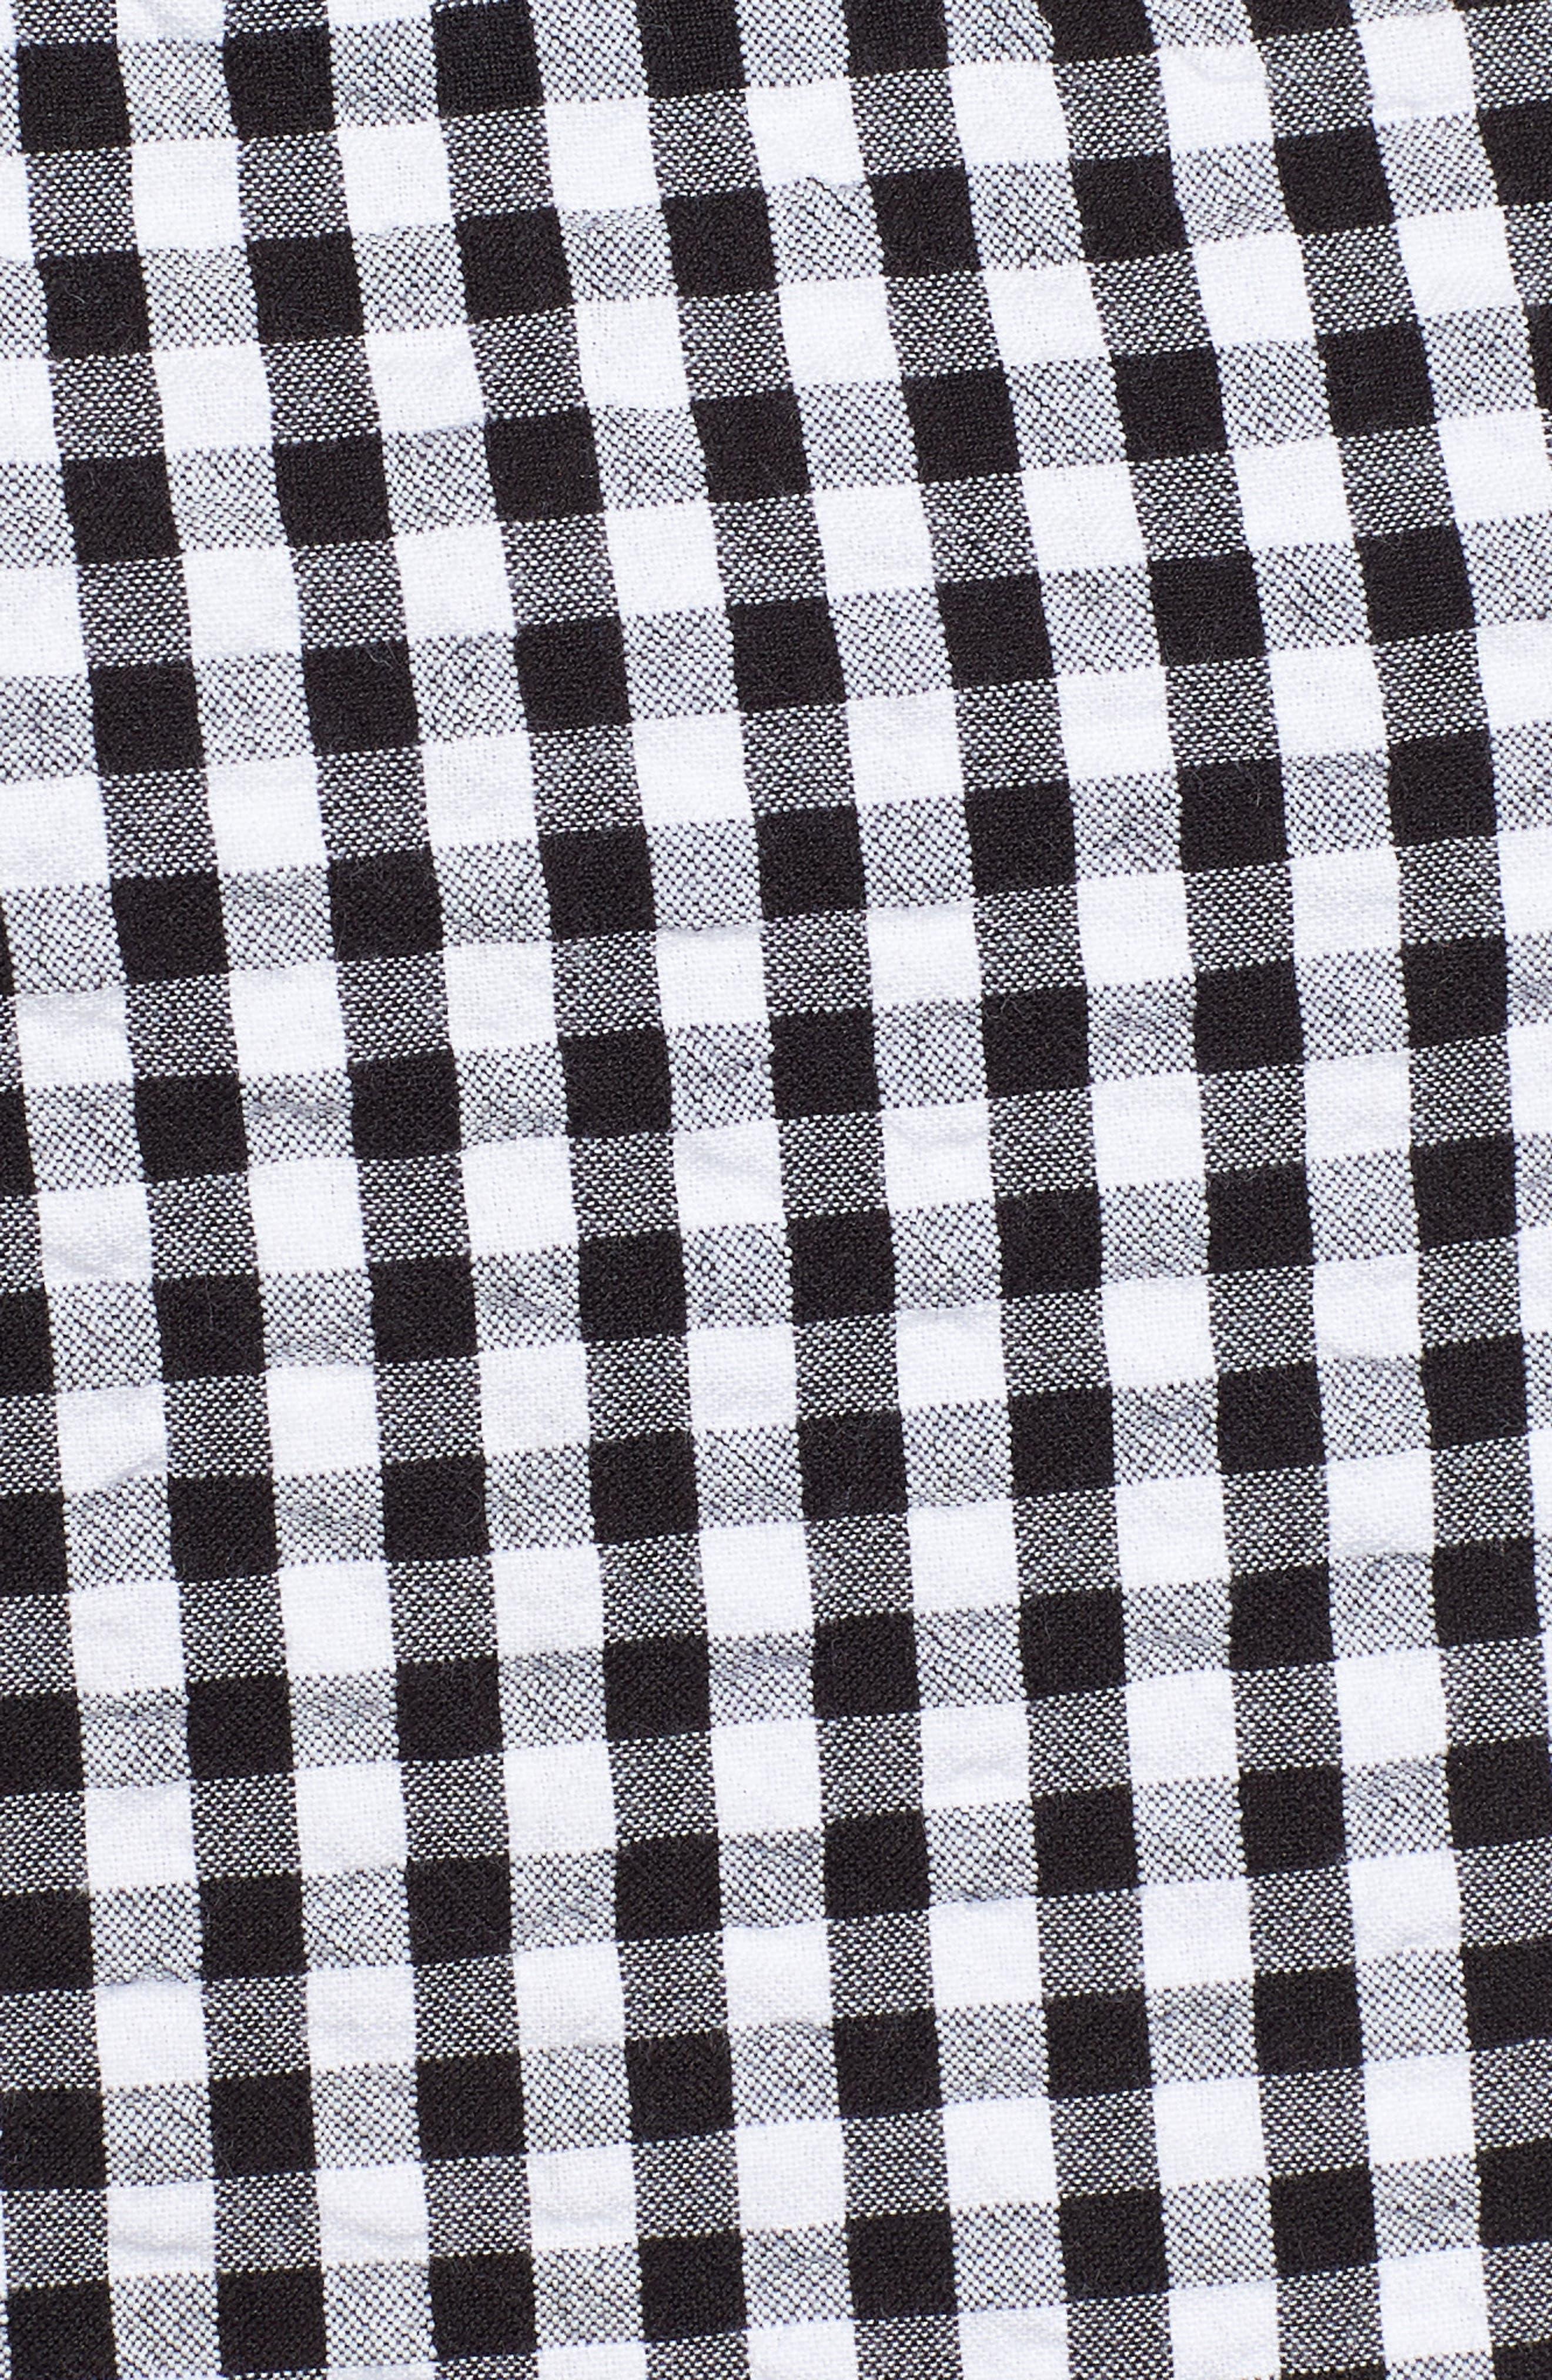 Tiered Ruffle Tassel Tie Tank,                             Alternate thumbnail 5, color,                             001